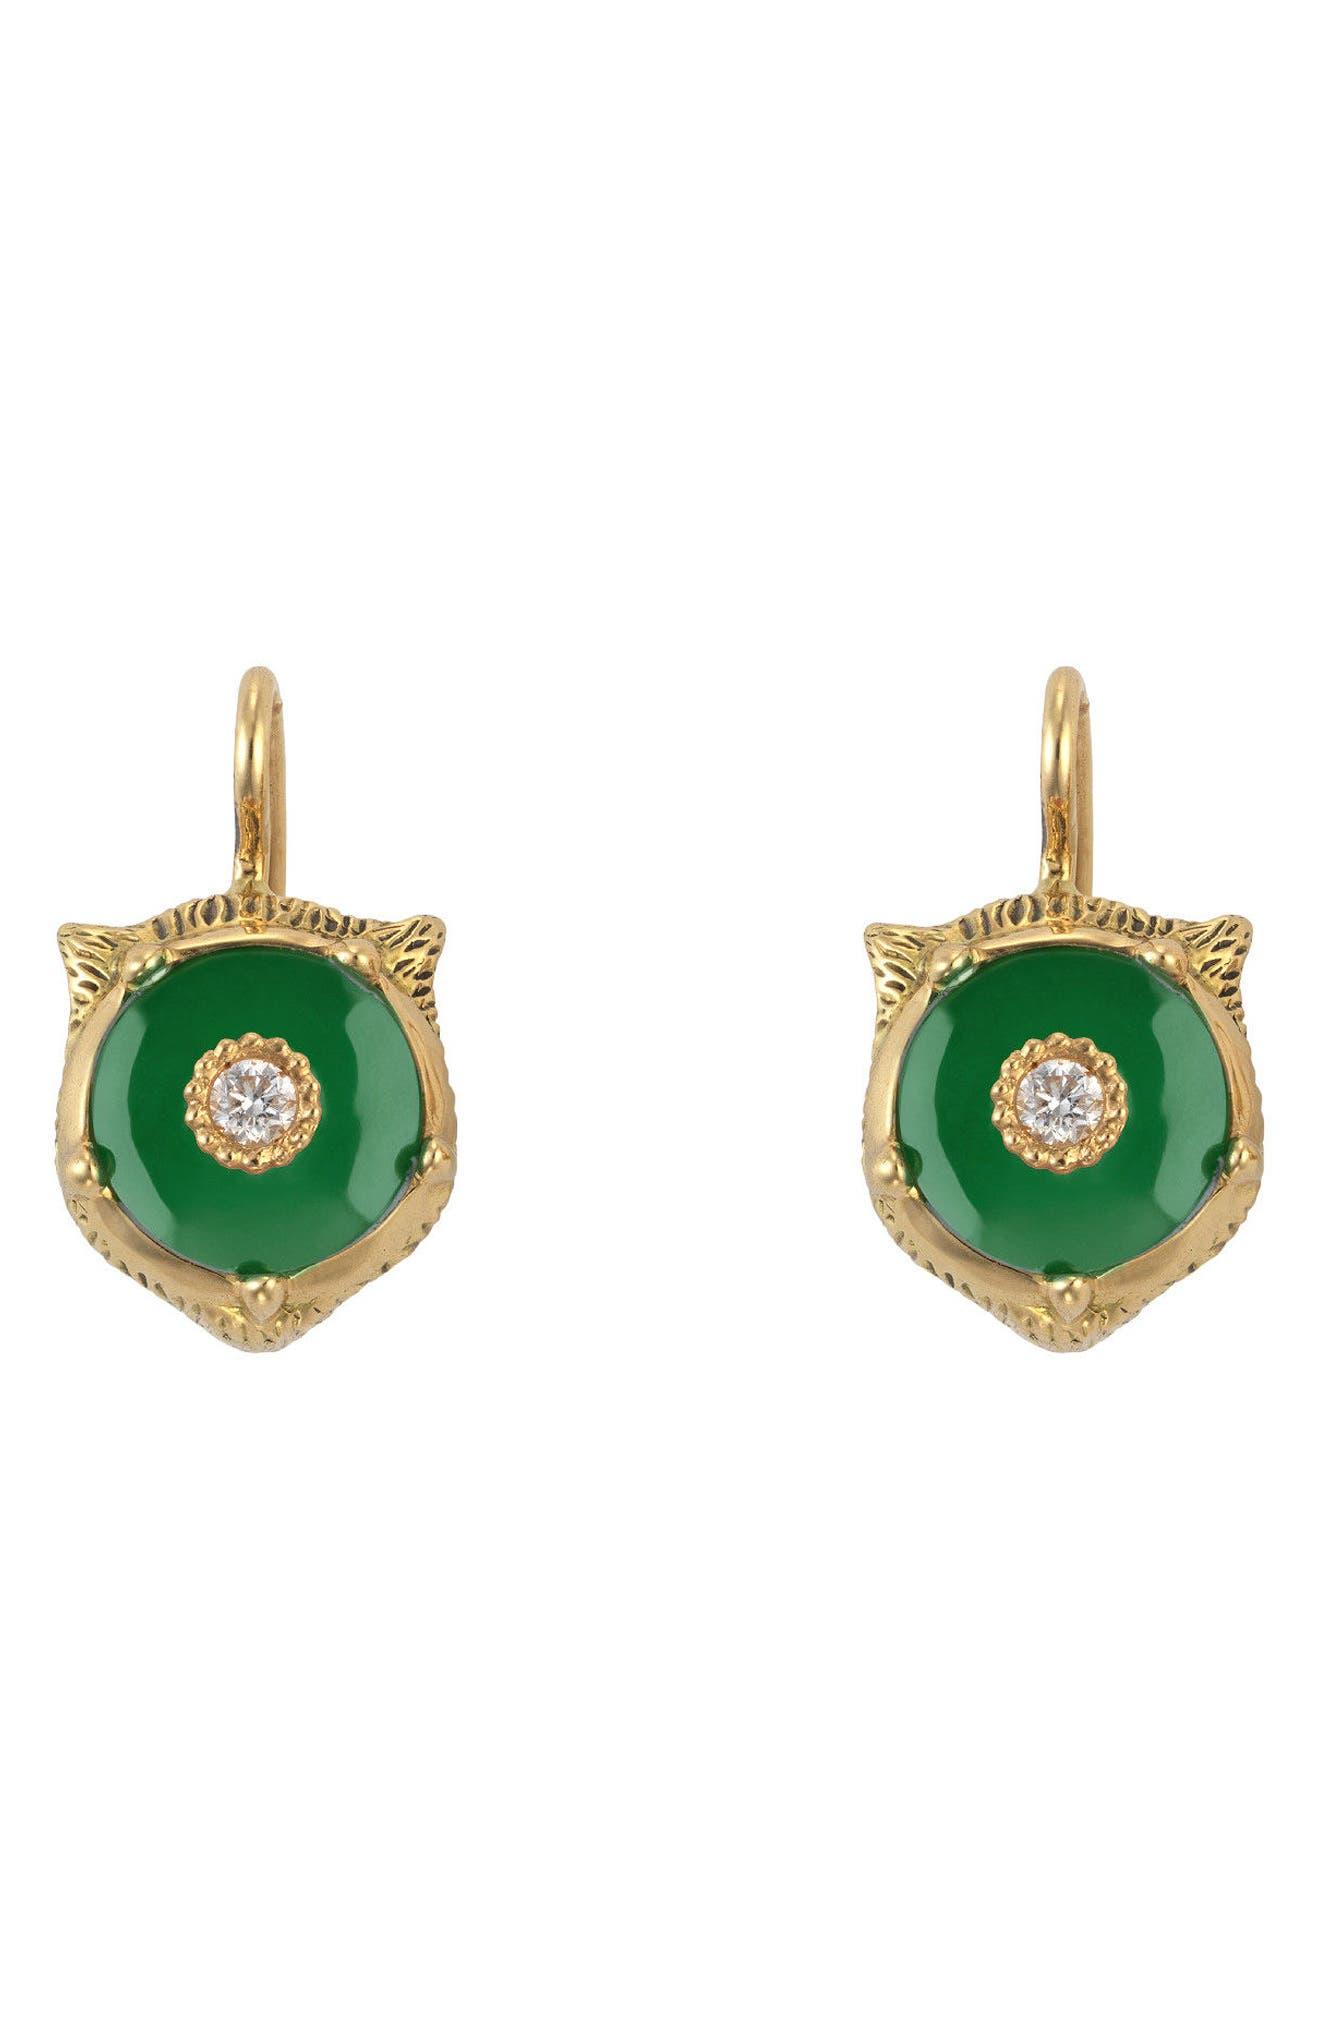 Feline Head Earrings,                         Main,                         color, Yellow Gold/ Green Jade